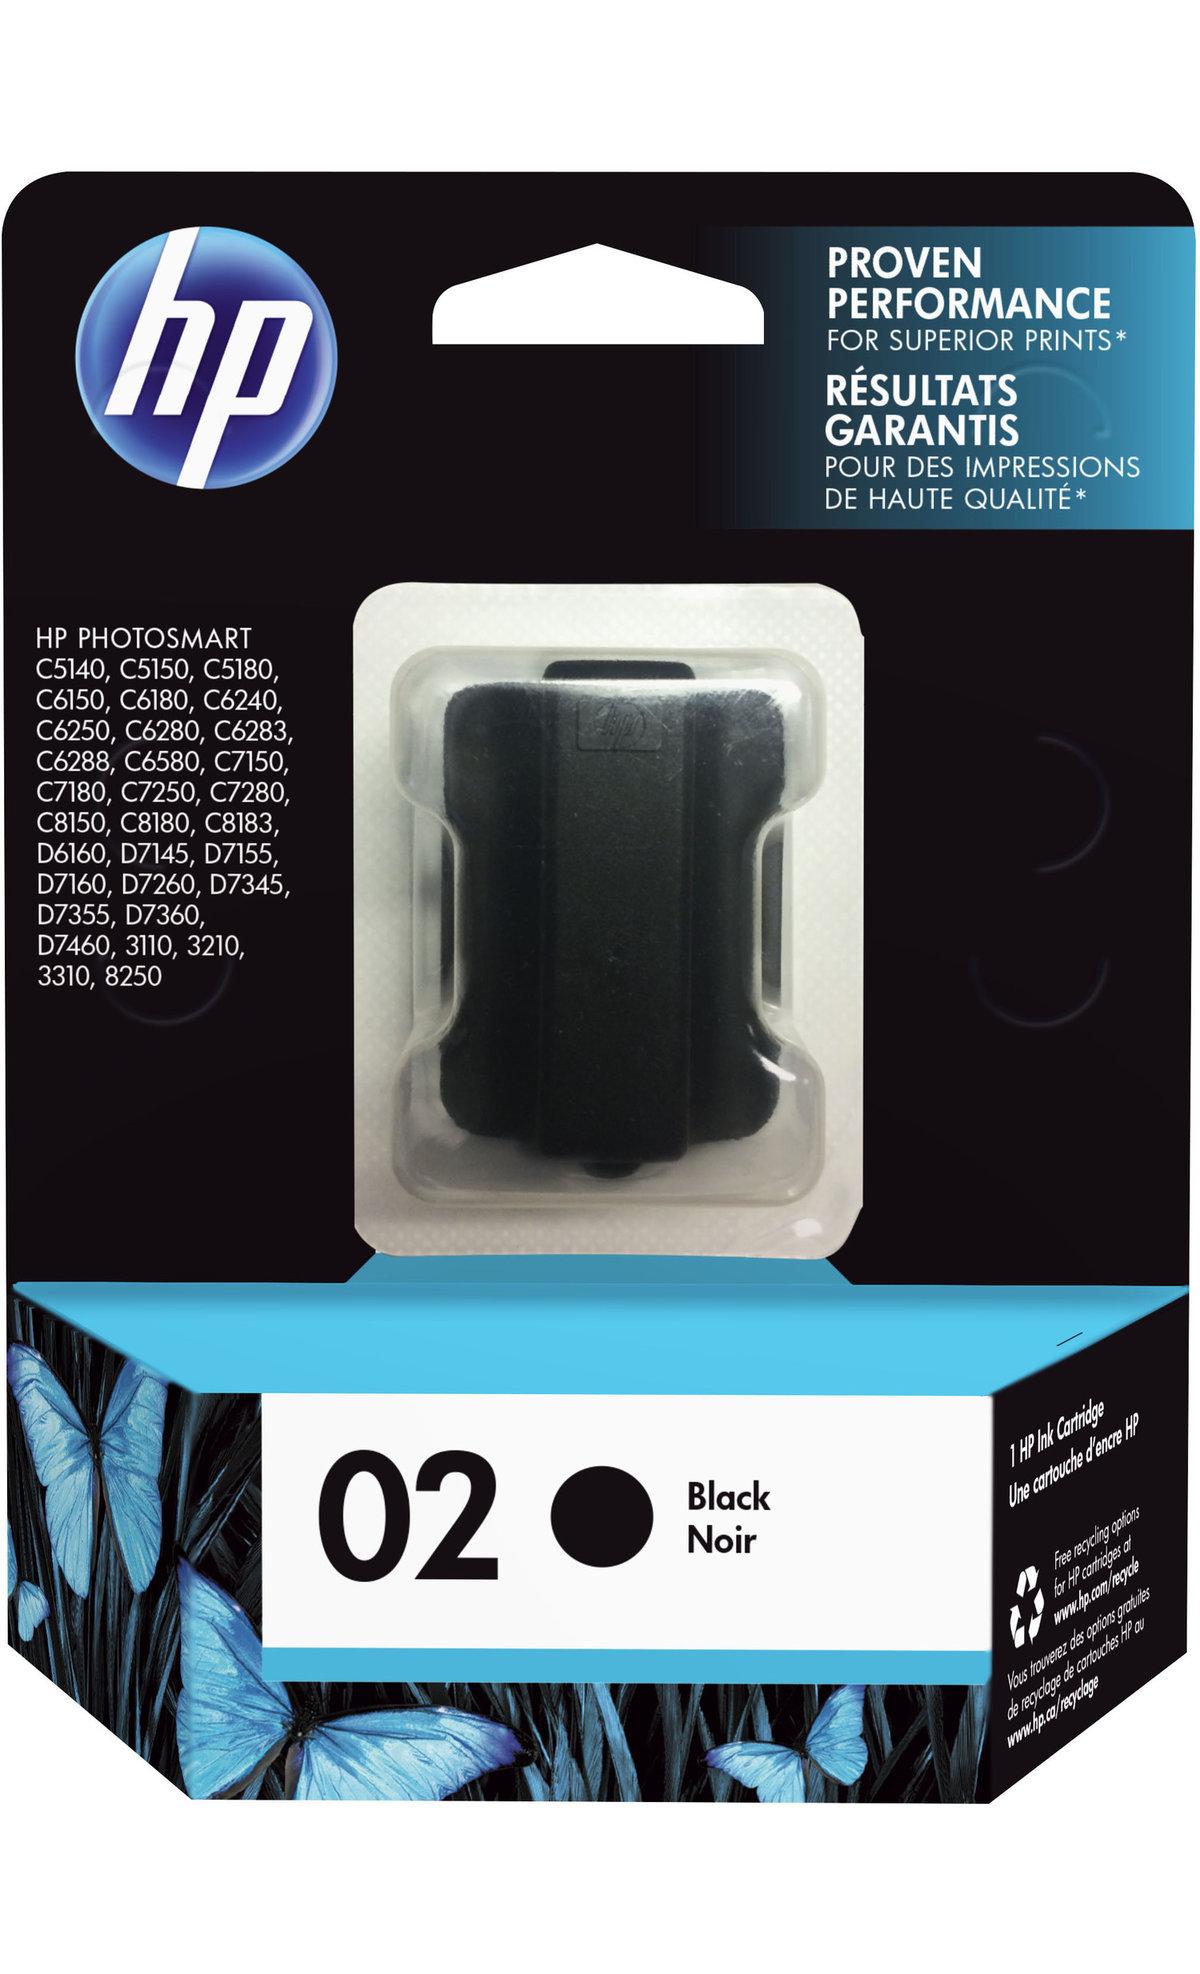 Hp Photosmart 3210 Specs